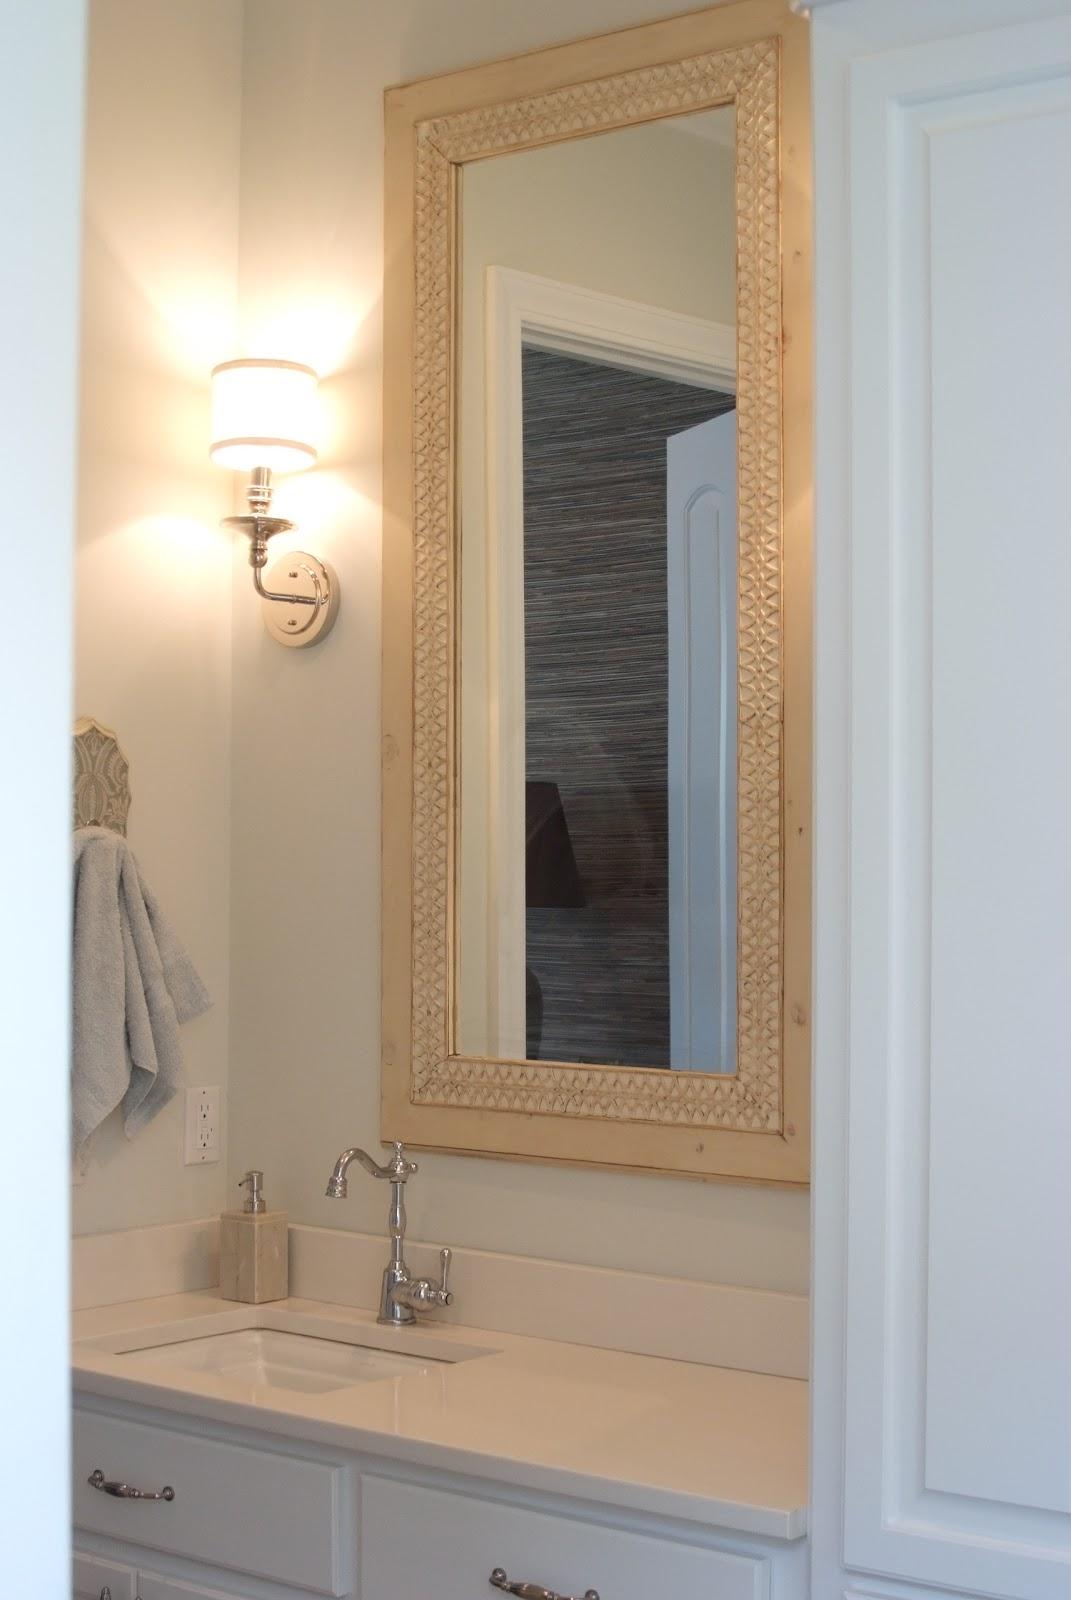 Kiwi wood werks designs custom mirror frames for Custom made bathroom mirrors